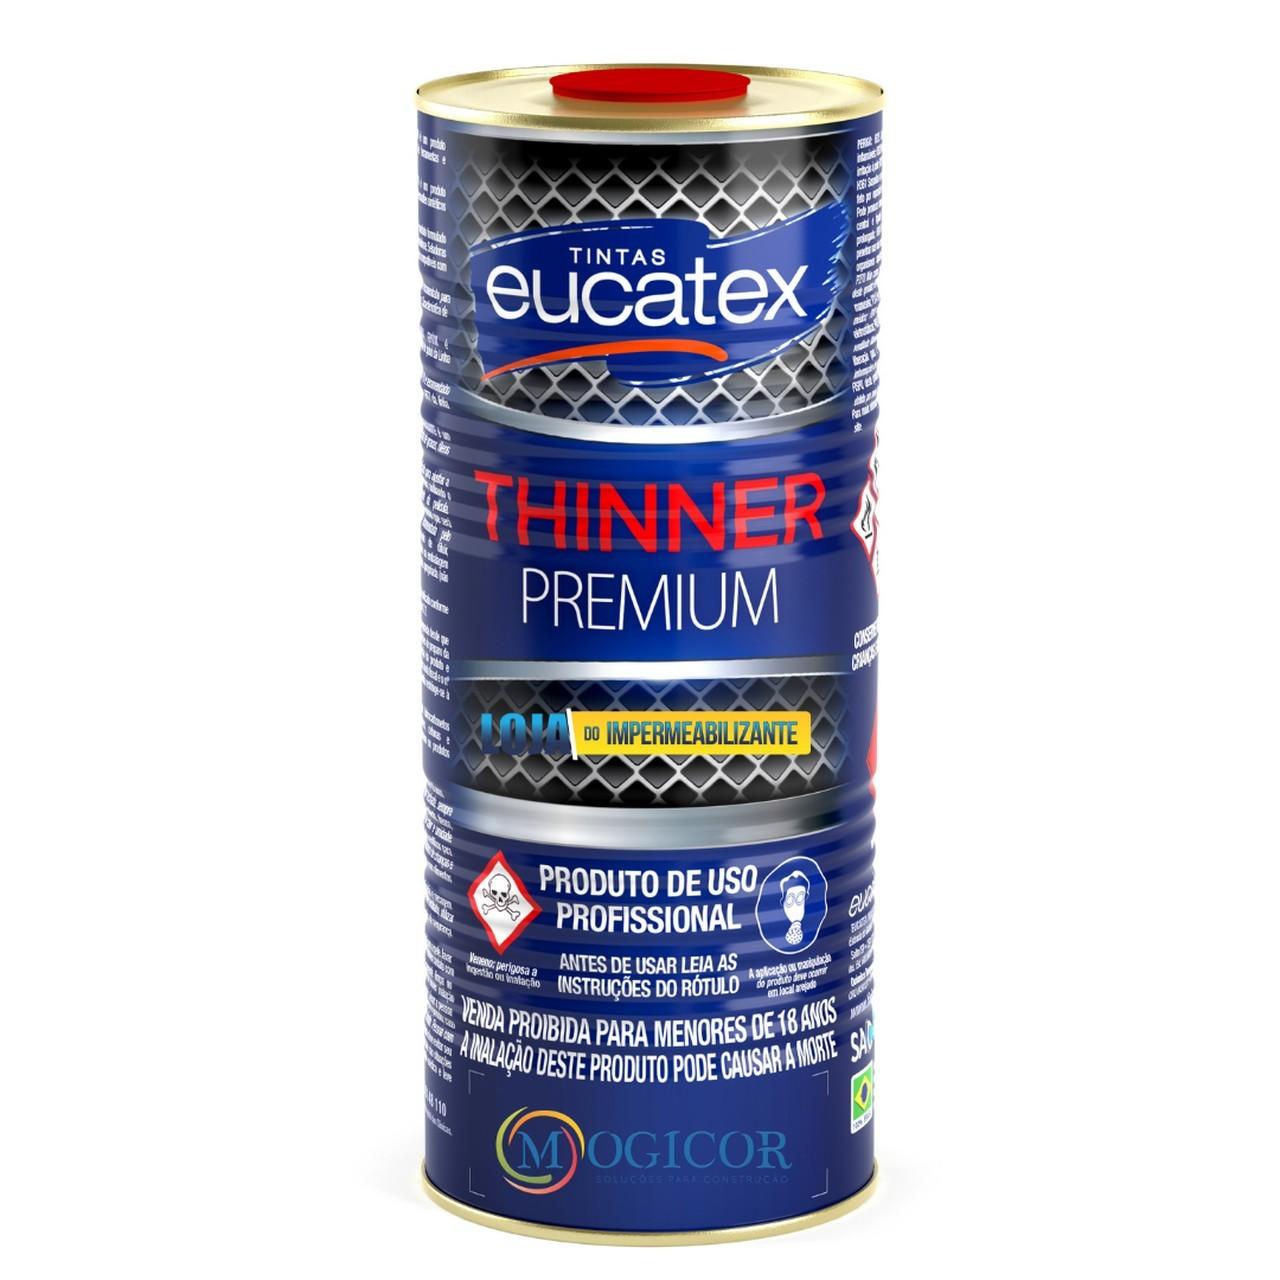 Thinner Premium p/ Limpeza de Tintas E Vernizes 900ml - Eucatex